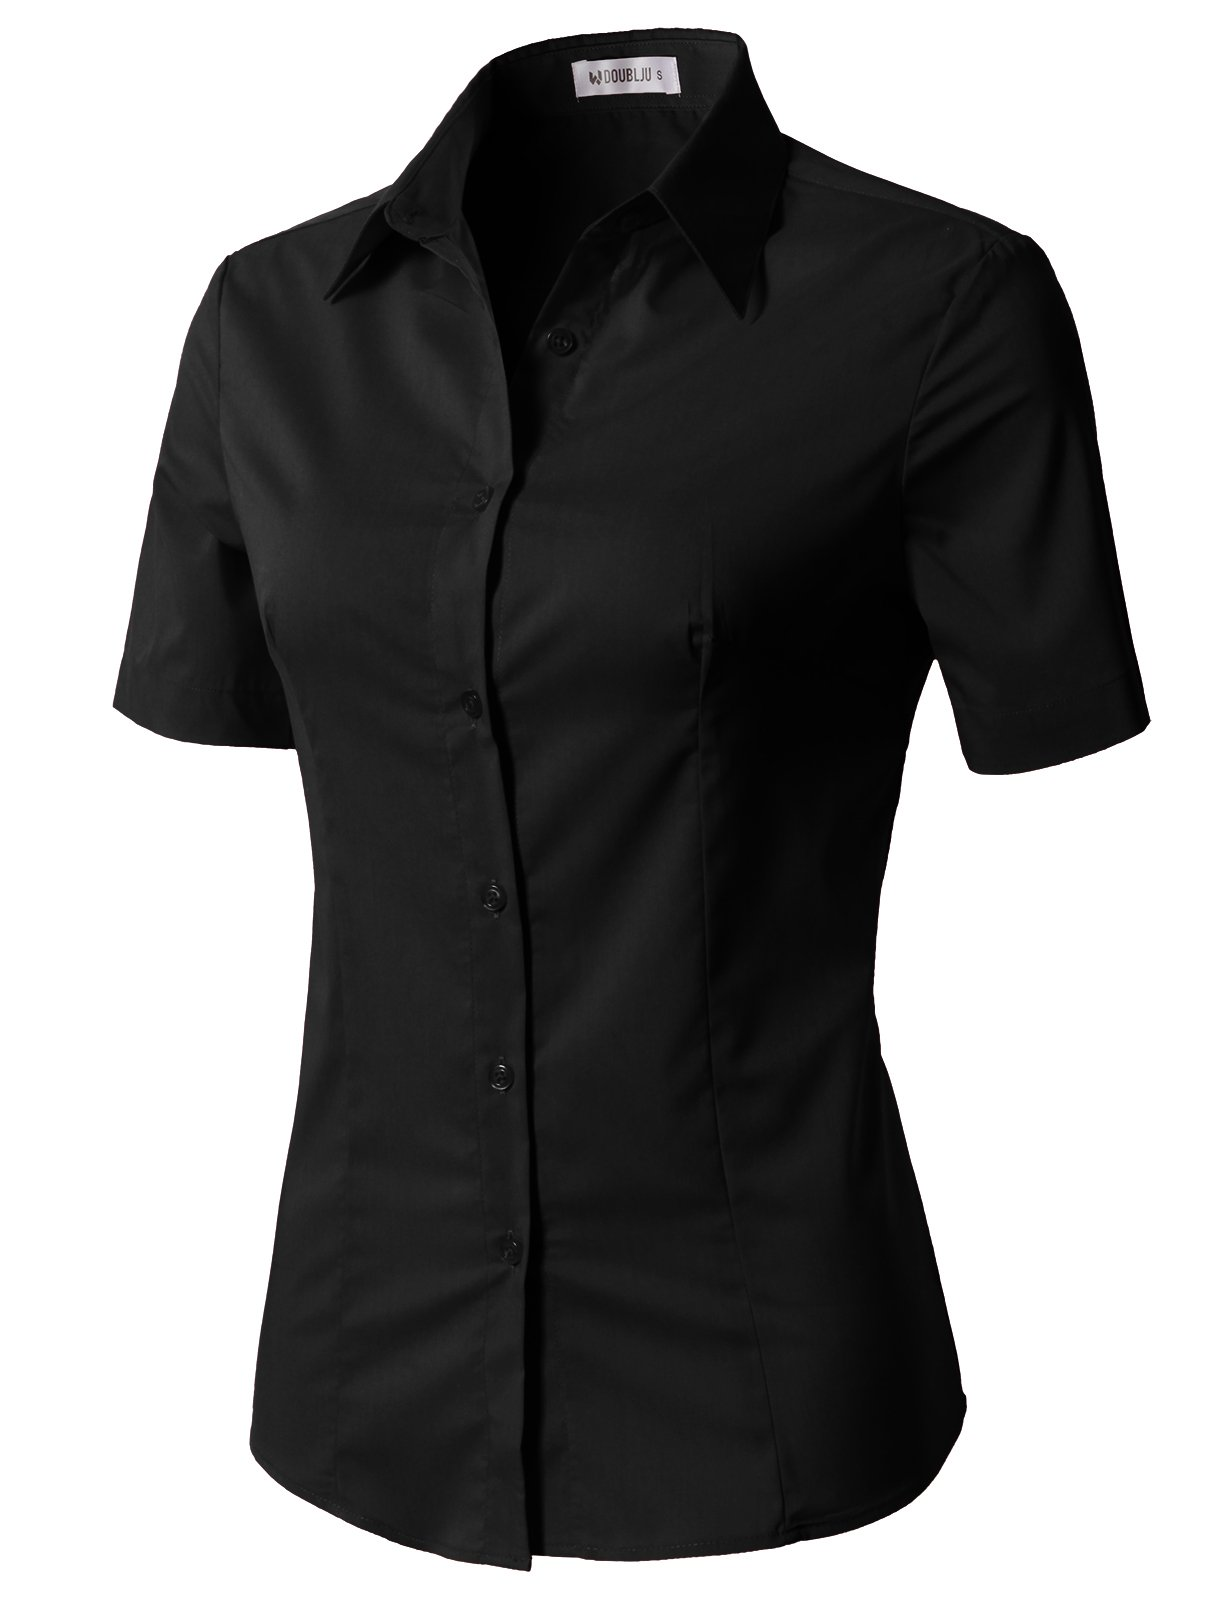 CLOVERY Women's Wrinkle-Free Short-Sleeve Slim Fit Button Down Shirt Black M